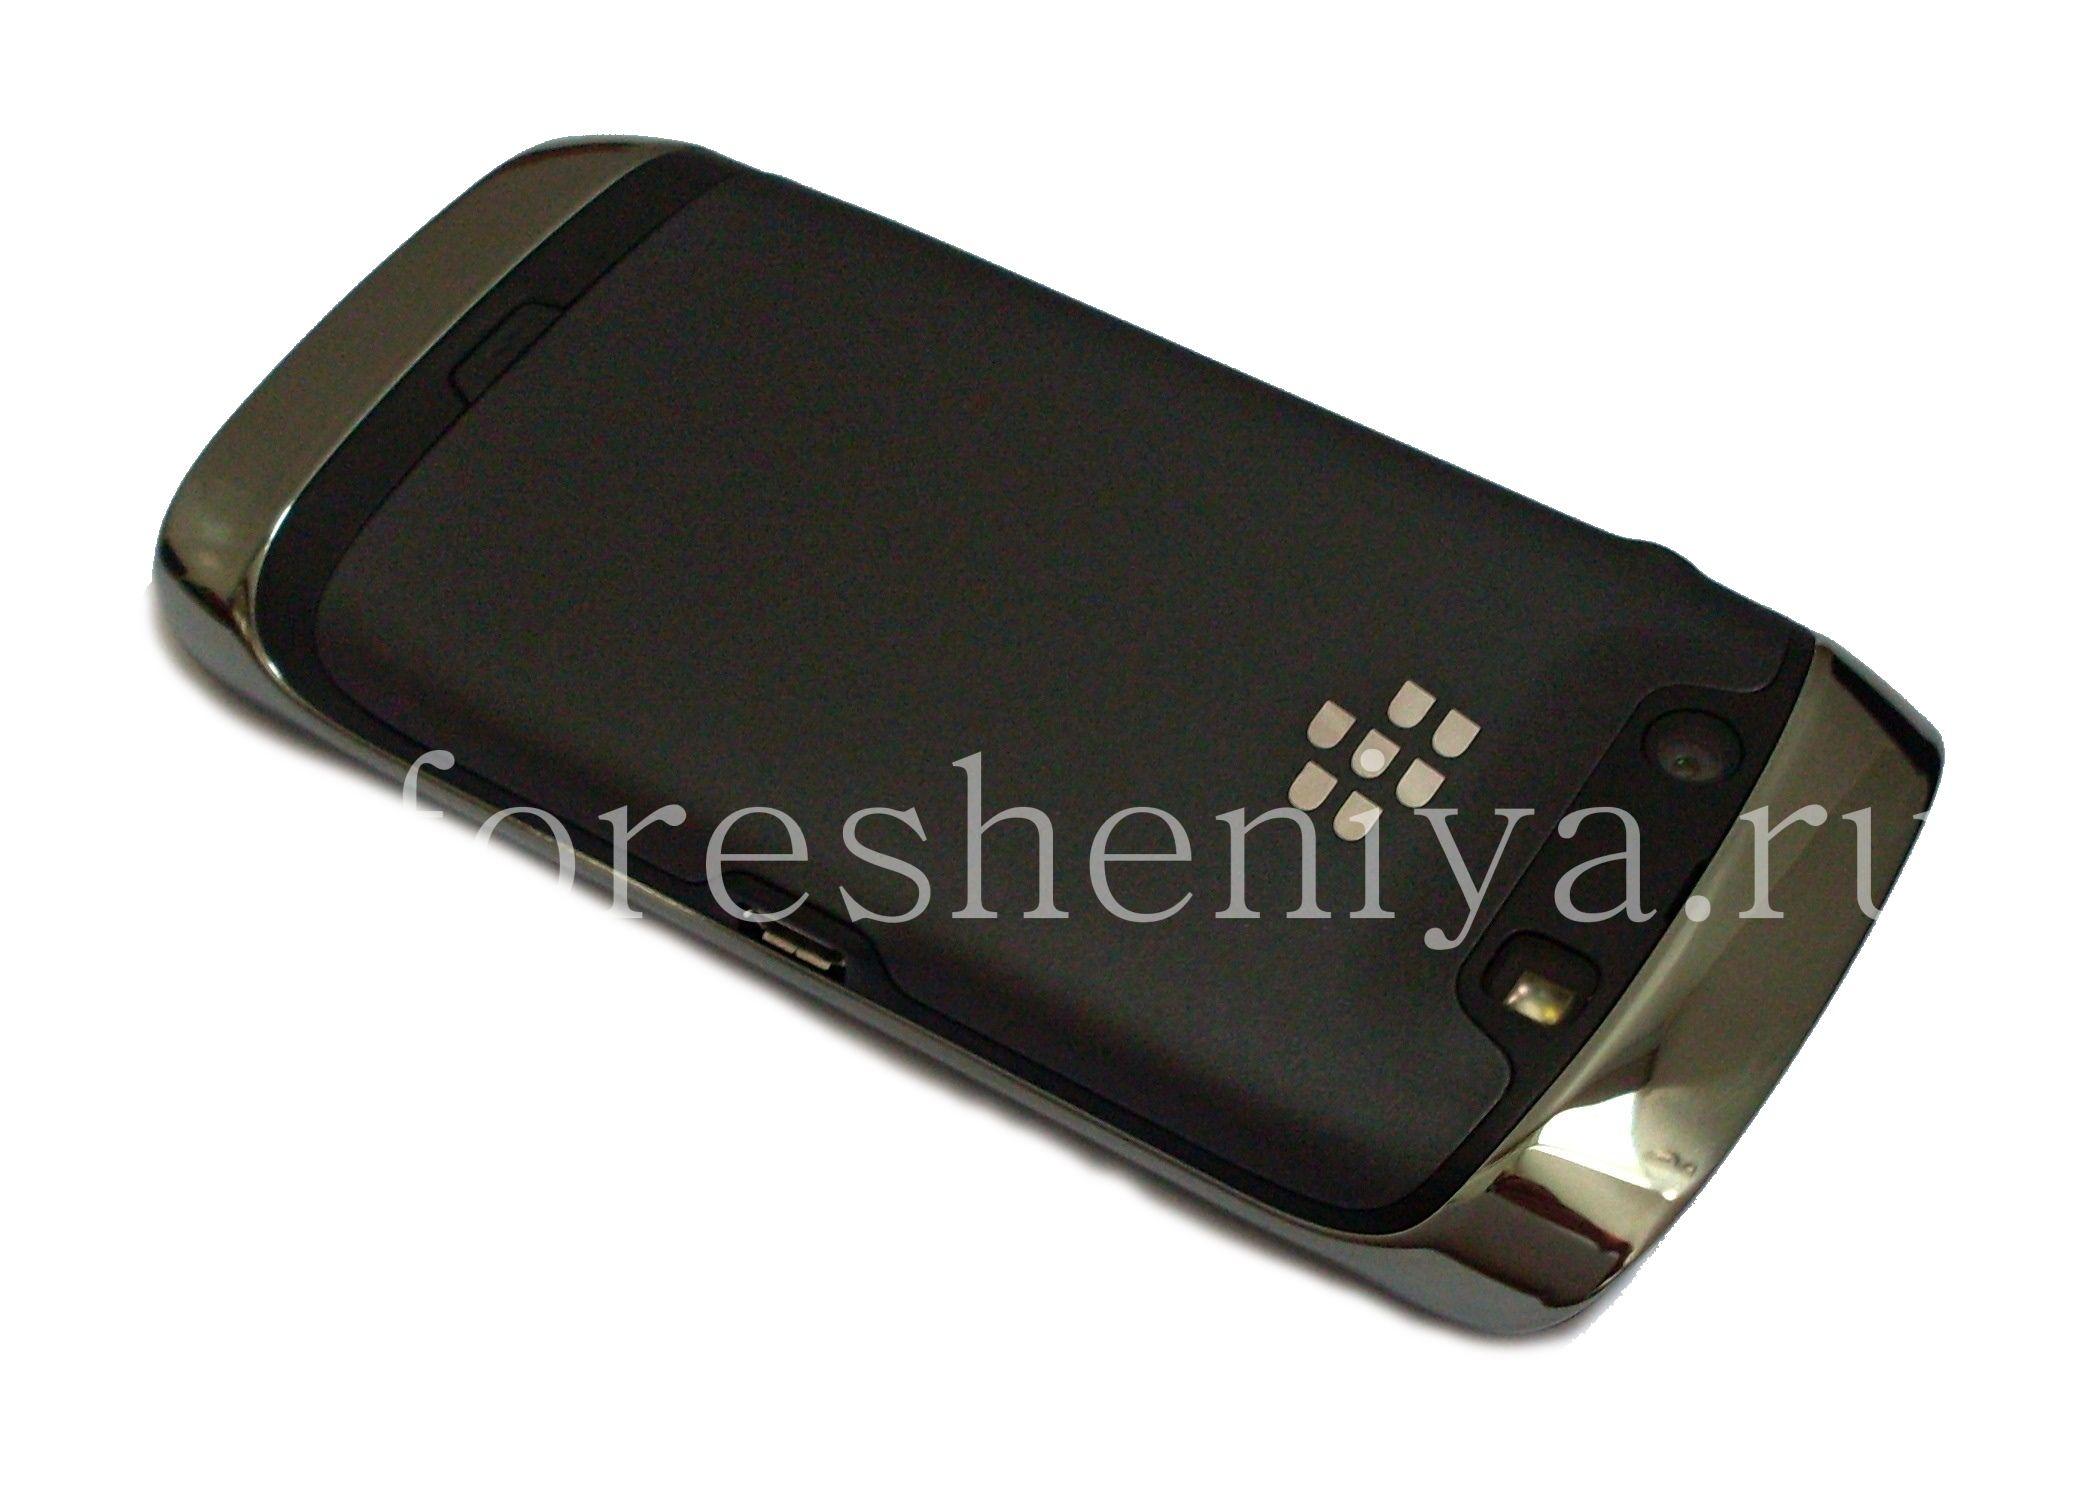 buy smartphone blackberry 9860 torch  black everything blackberry torch 9850 manual BlackBerry Curve 9300